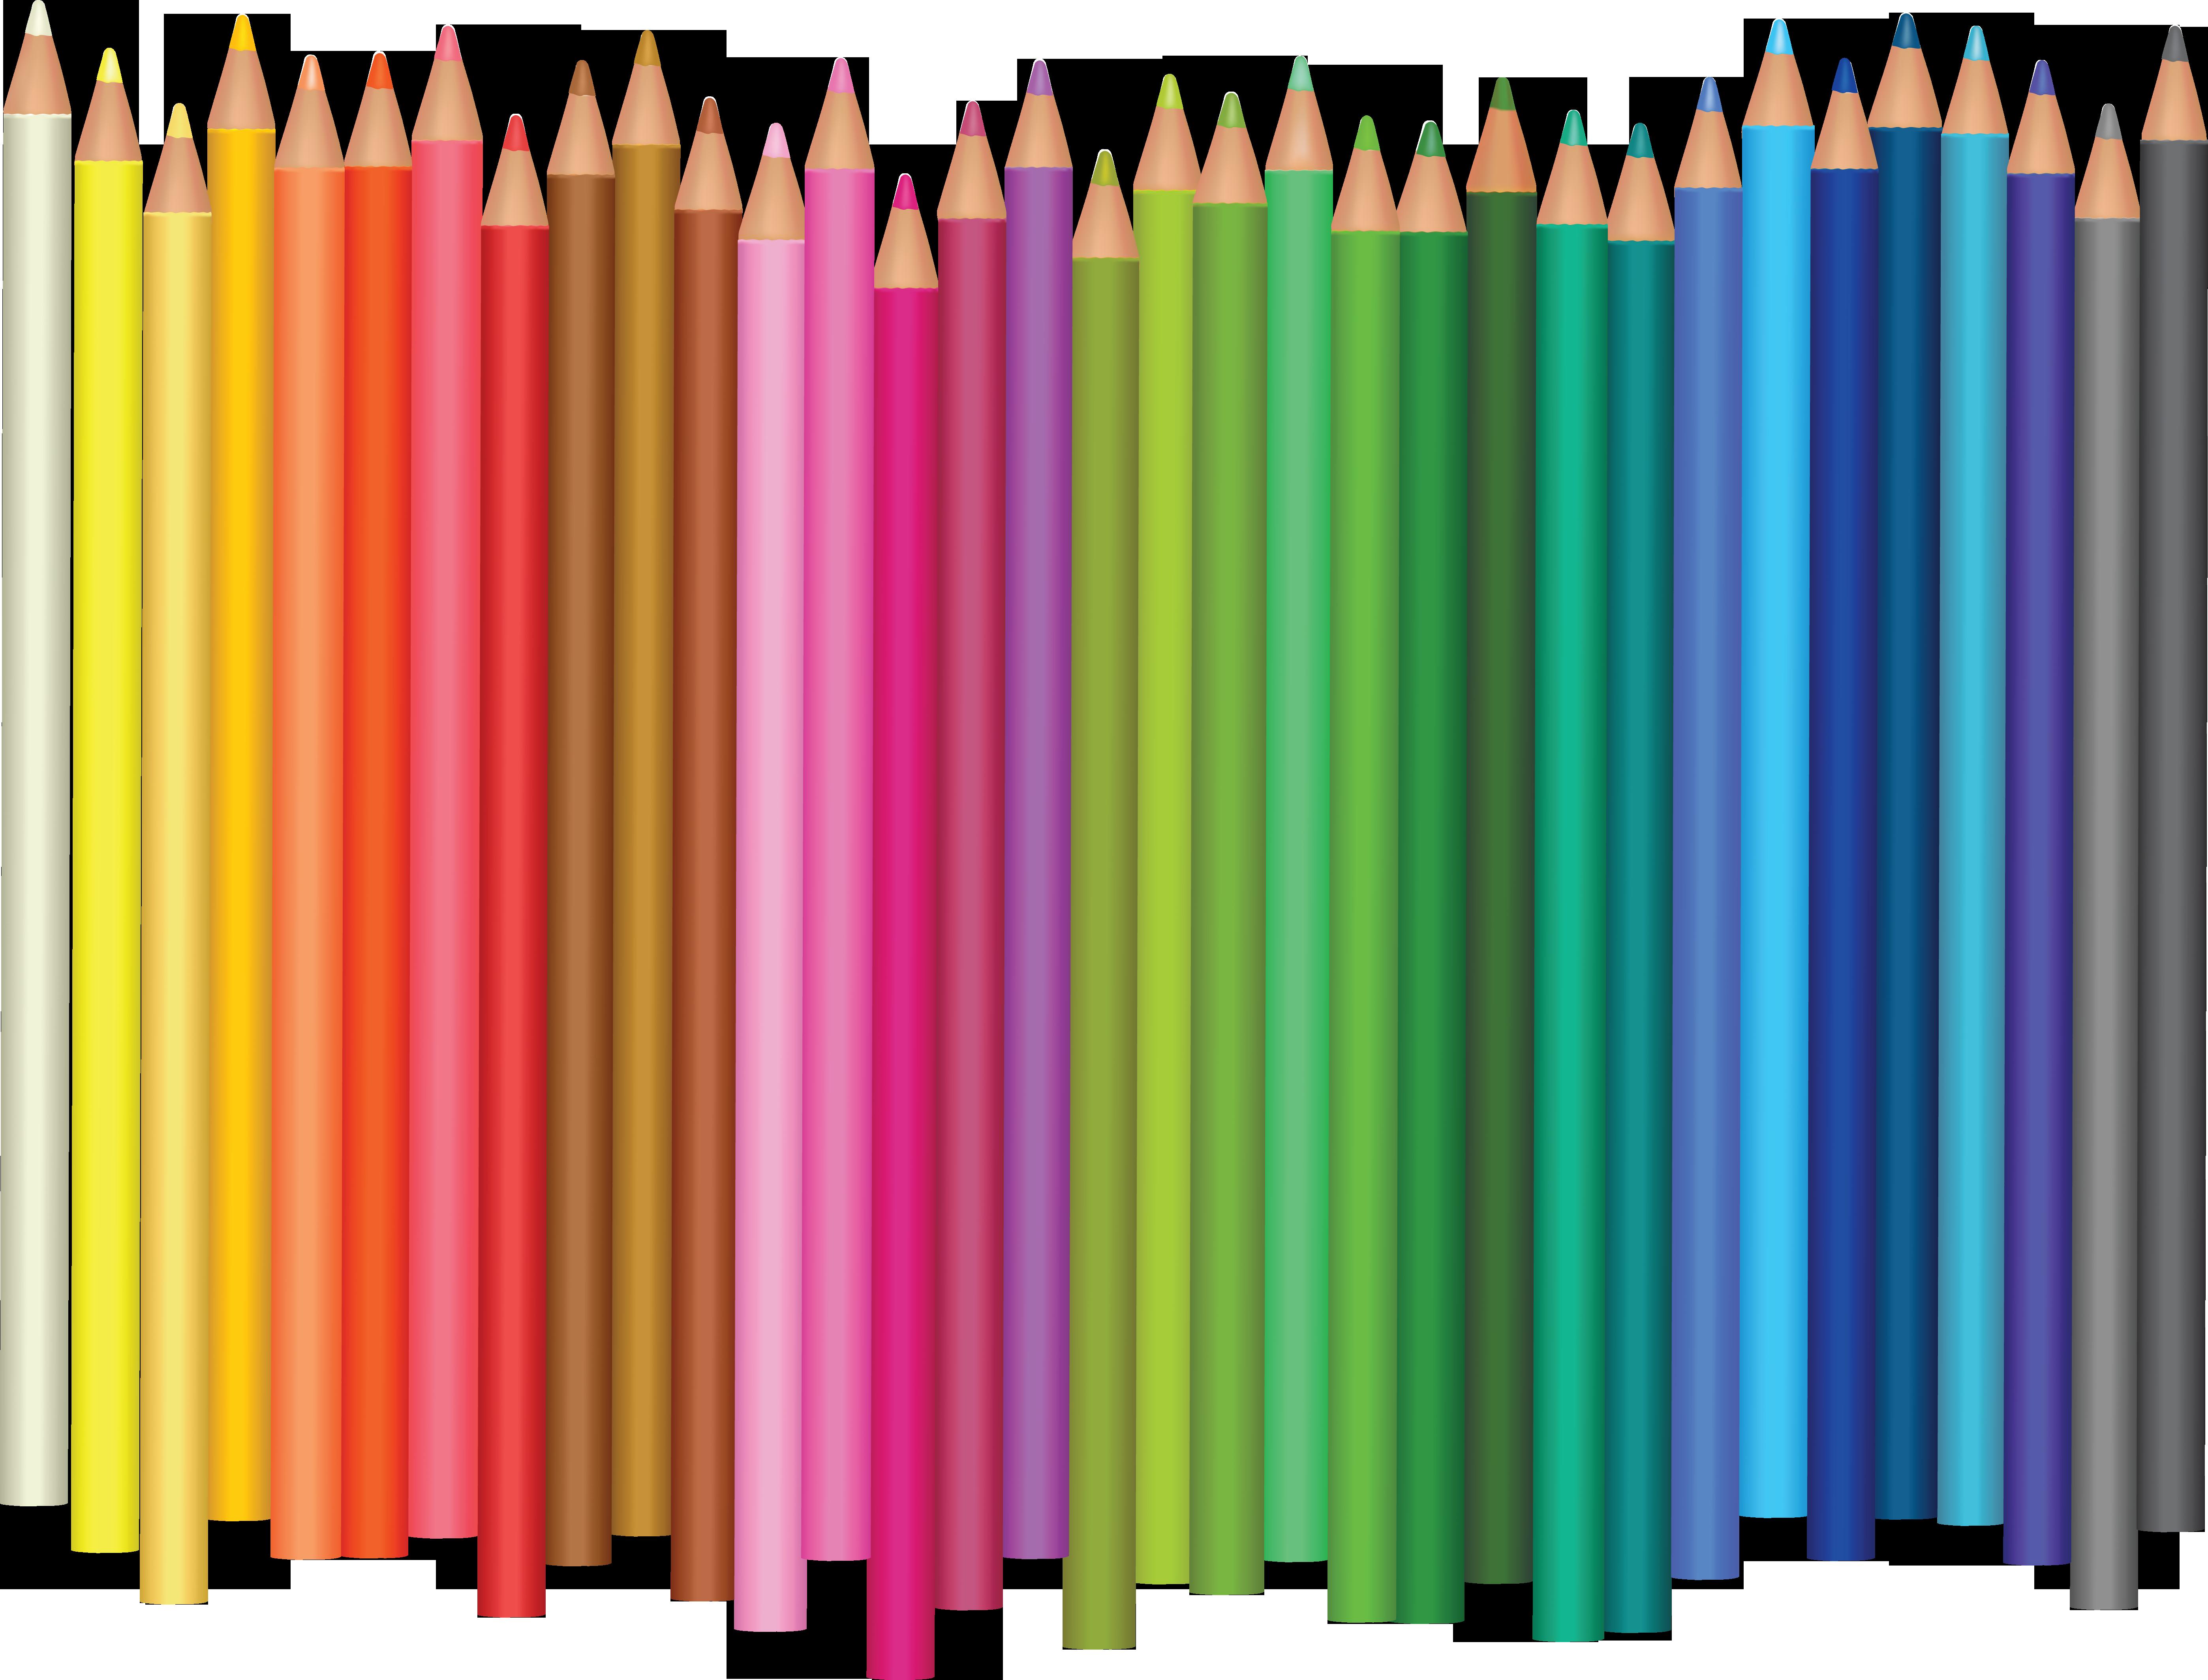 Color Pencil S Png Image Colored Pencils Pencil Png Pencil